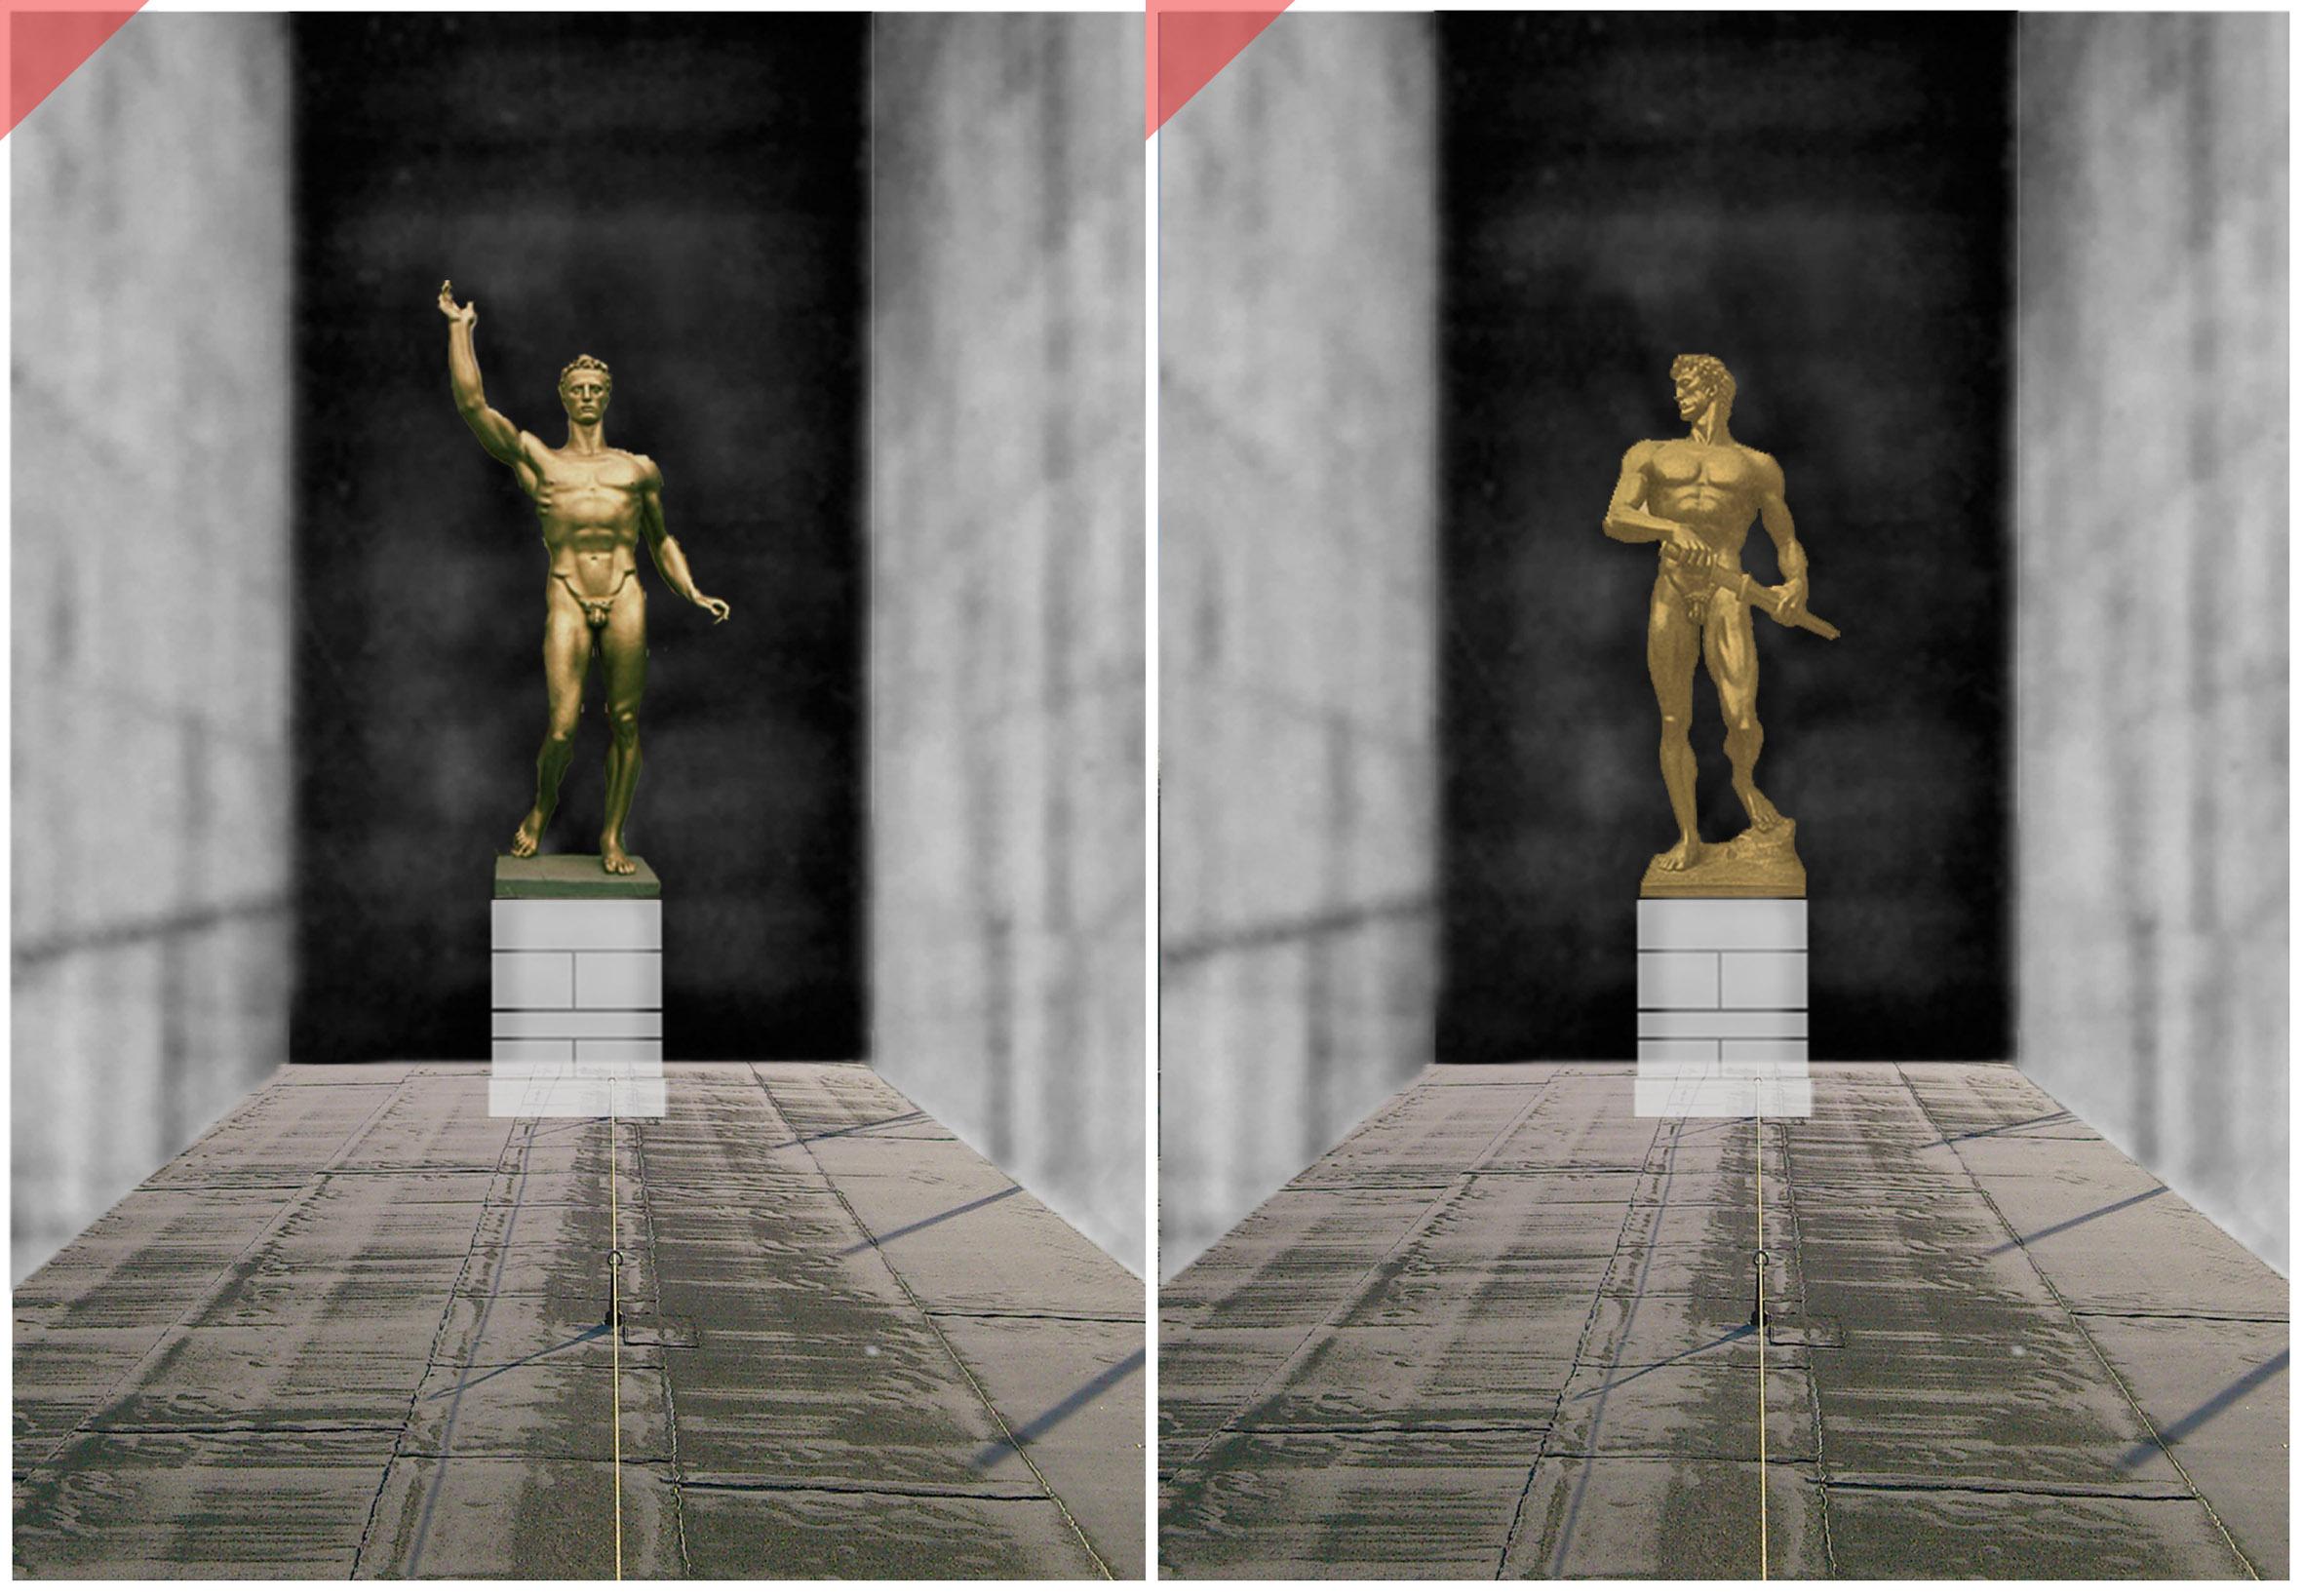 Zeppelintribüne-Nürnberg-Skulpturen-Plastiken-Arno-Breker-1939-Künder-Bereitschaft-vergoldet-Bronze-Säulen-Kolonnaden-1967-Zeppelin-field-grandstand-Nuremberg-sculptures-planned-figurine-golden-gilded-bronze Arno-Breker-1939-Seer-Readieness